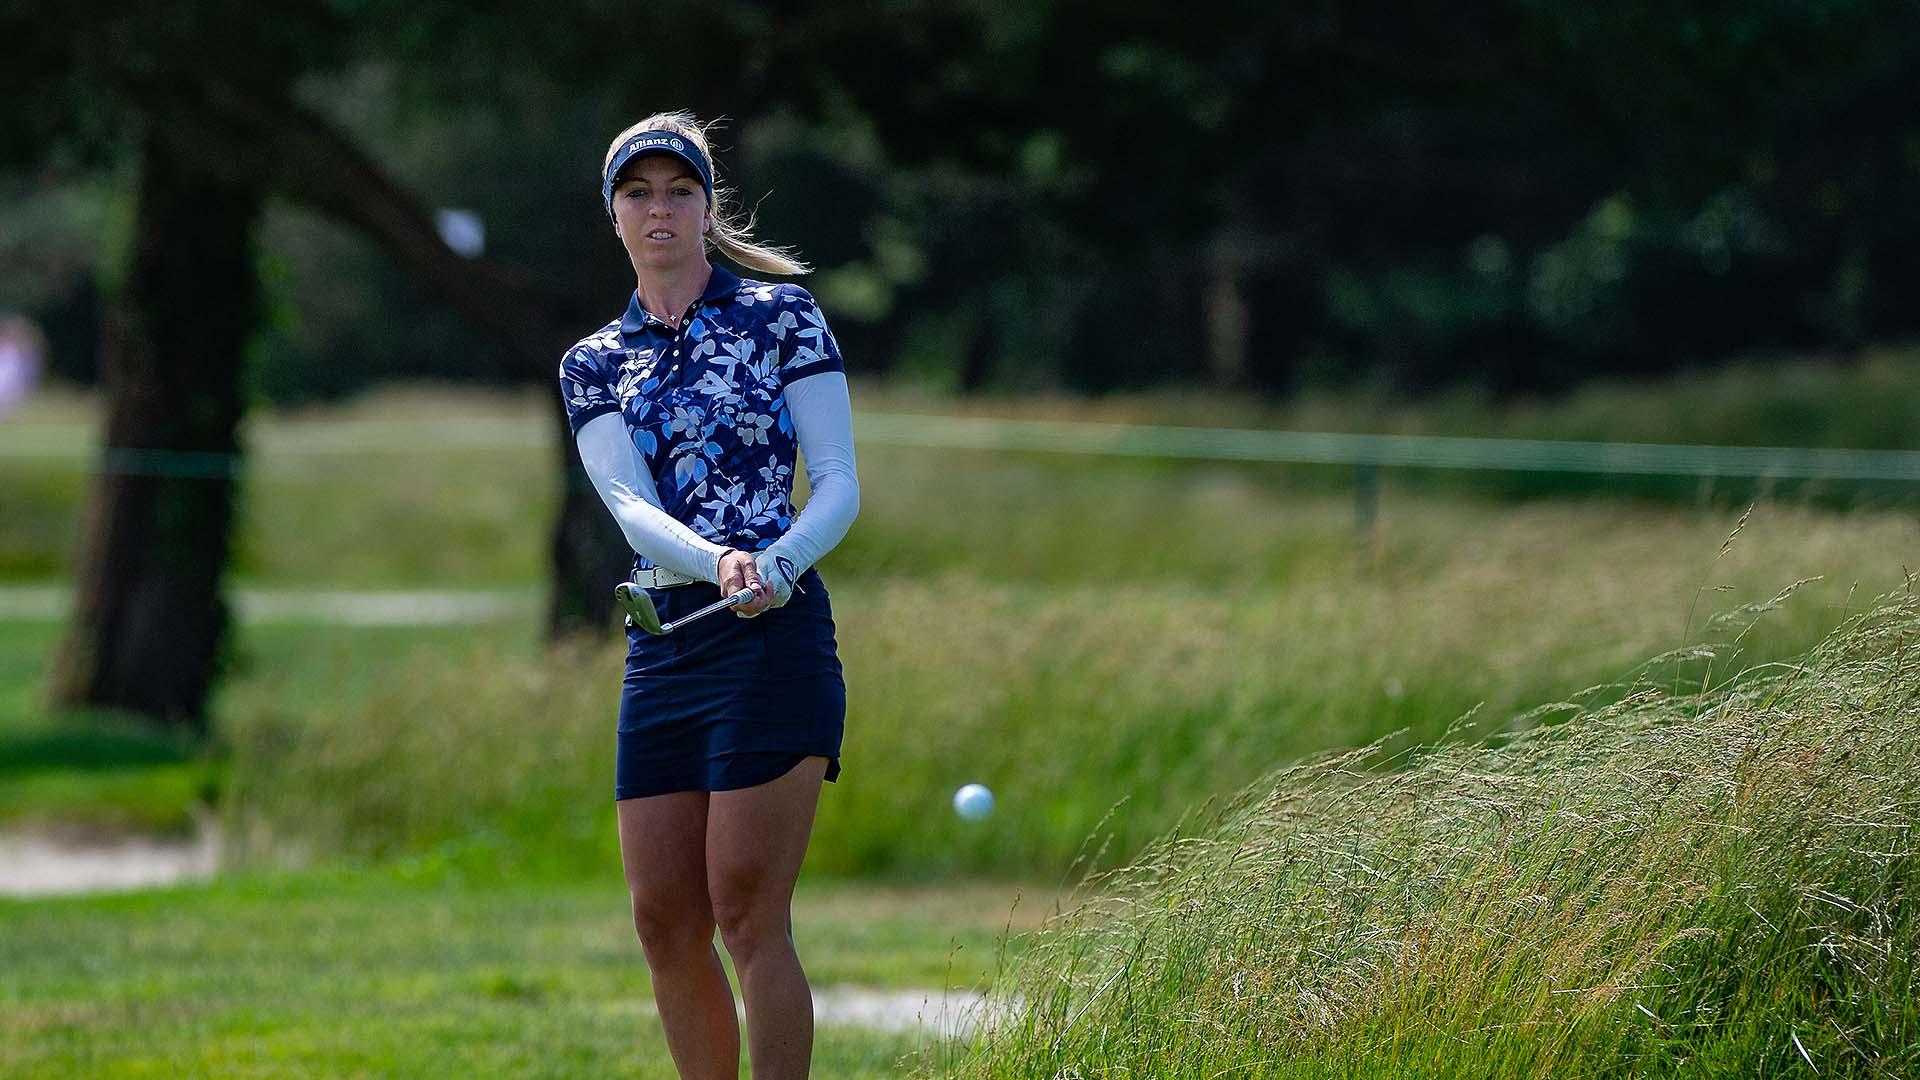 Big Sunday Could Bring LPGA Promotions At Symetra Tour